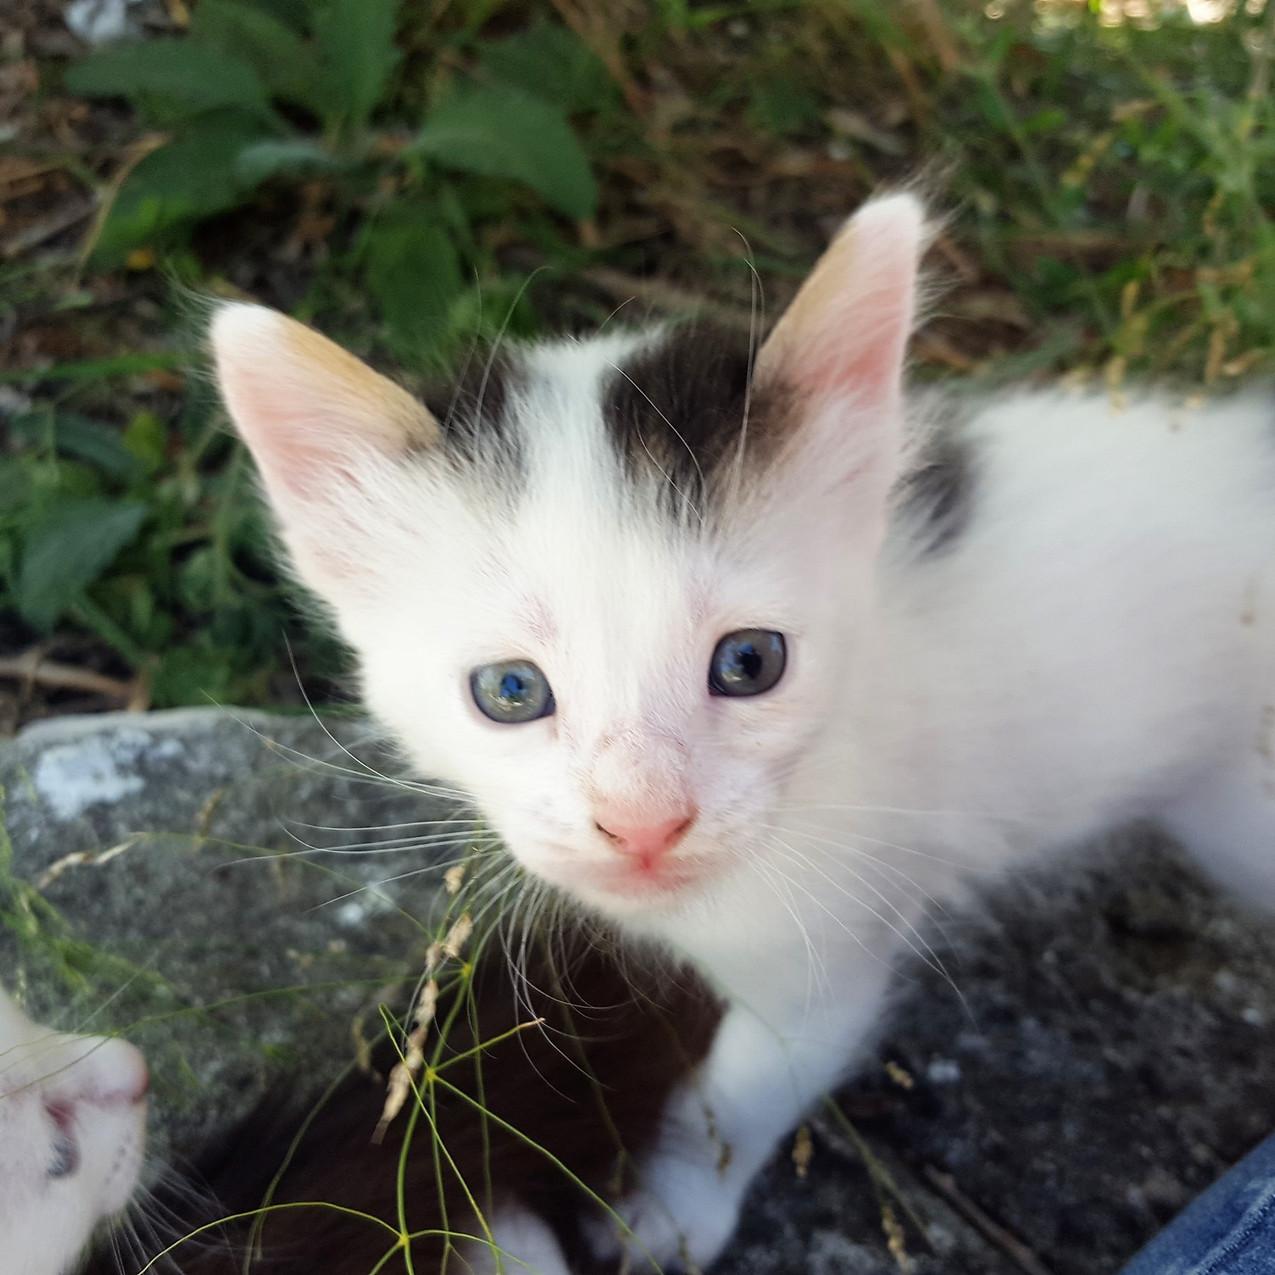 Boy kitty 29 June 2020